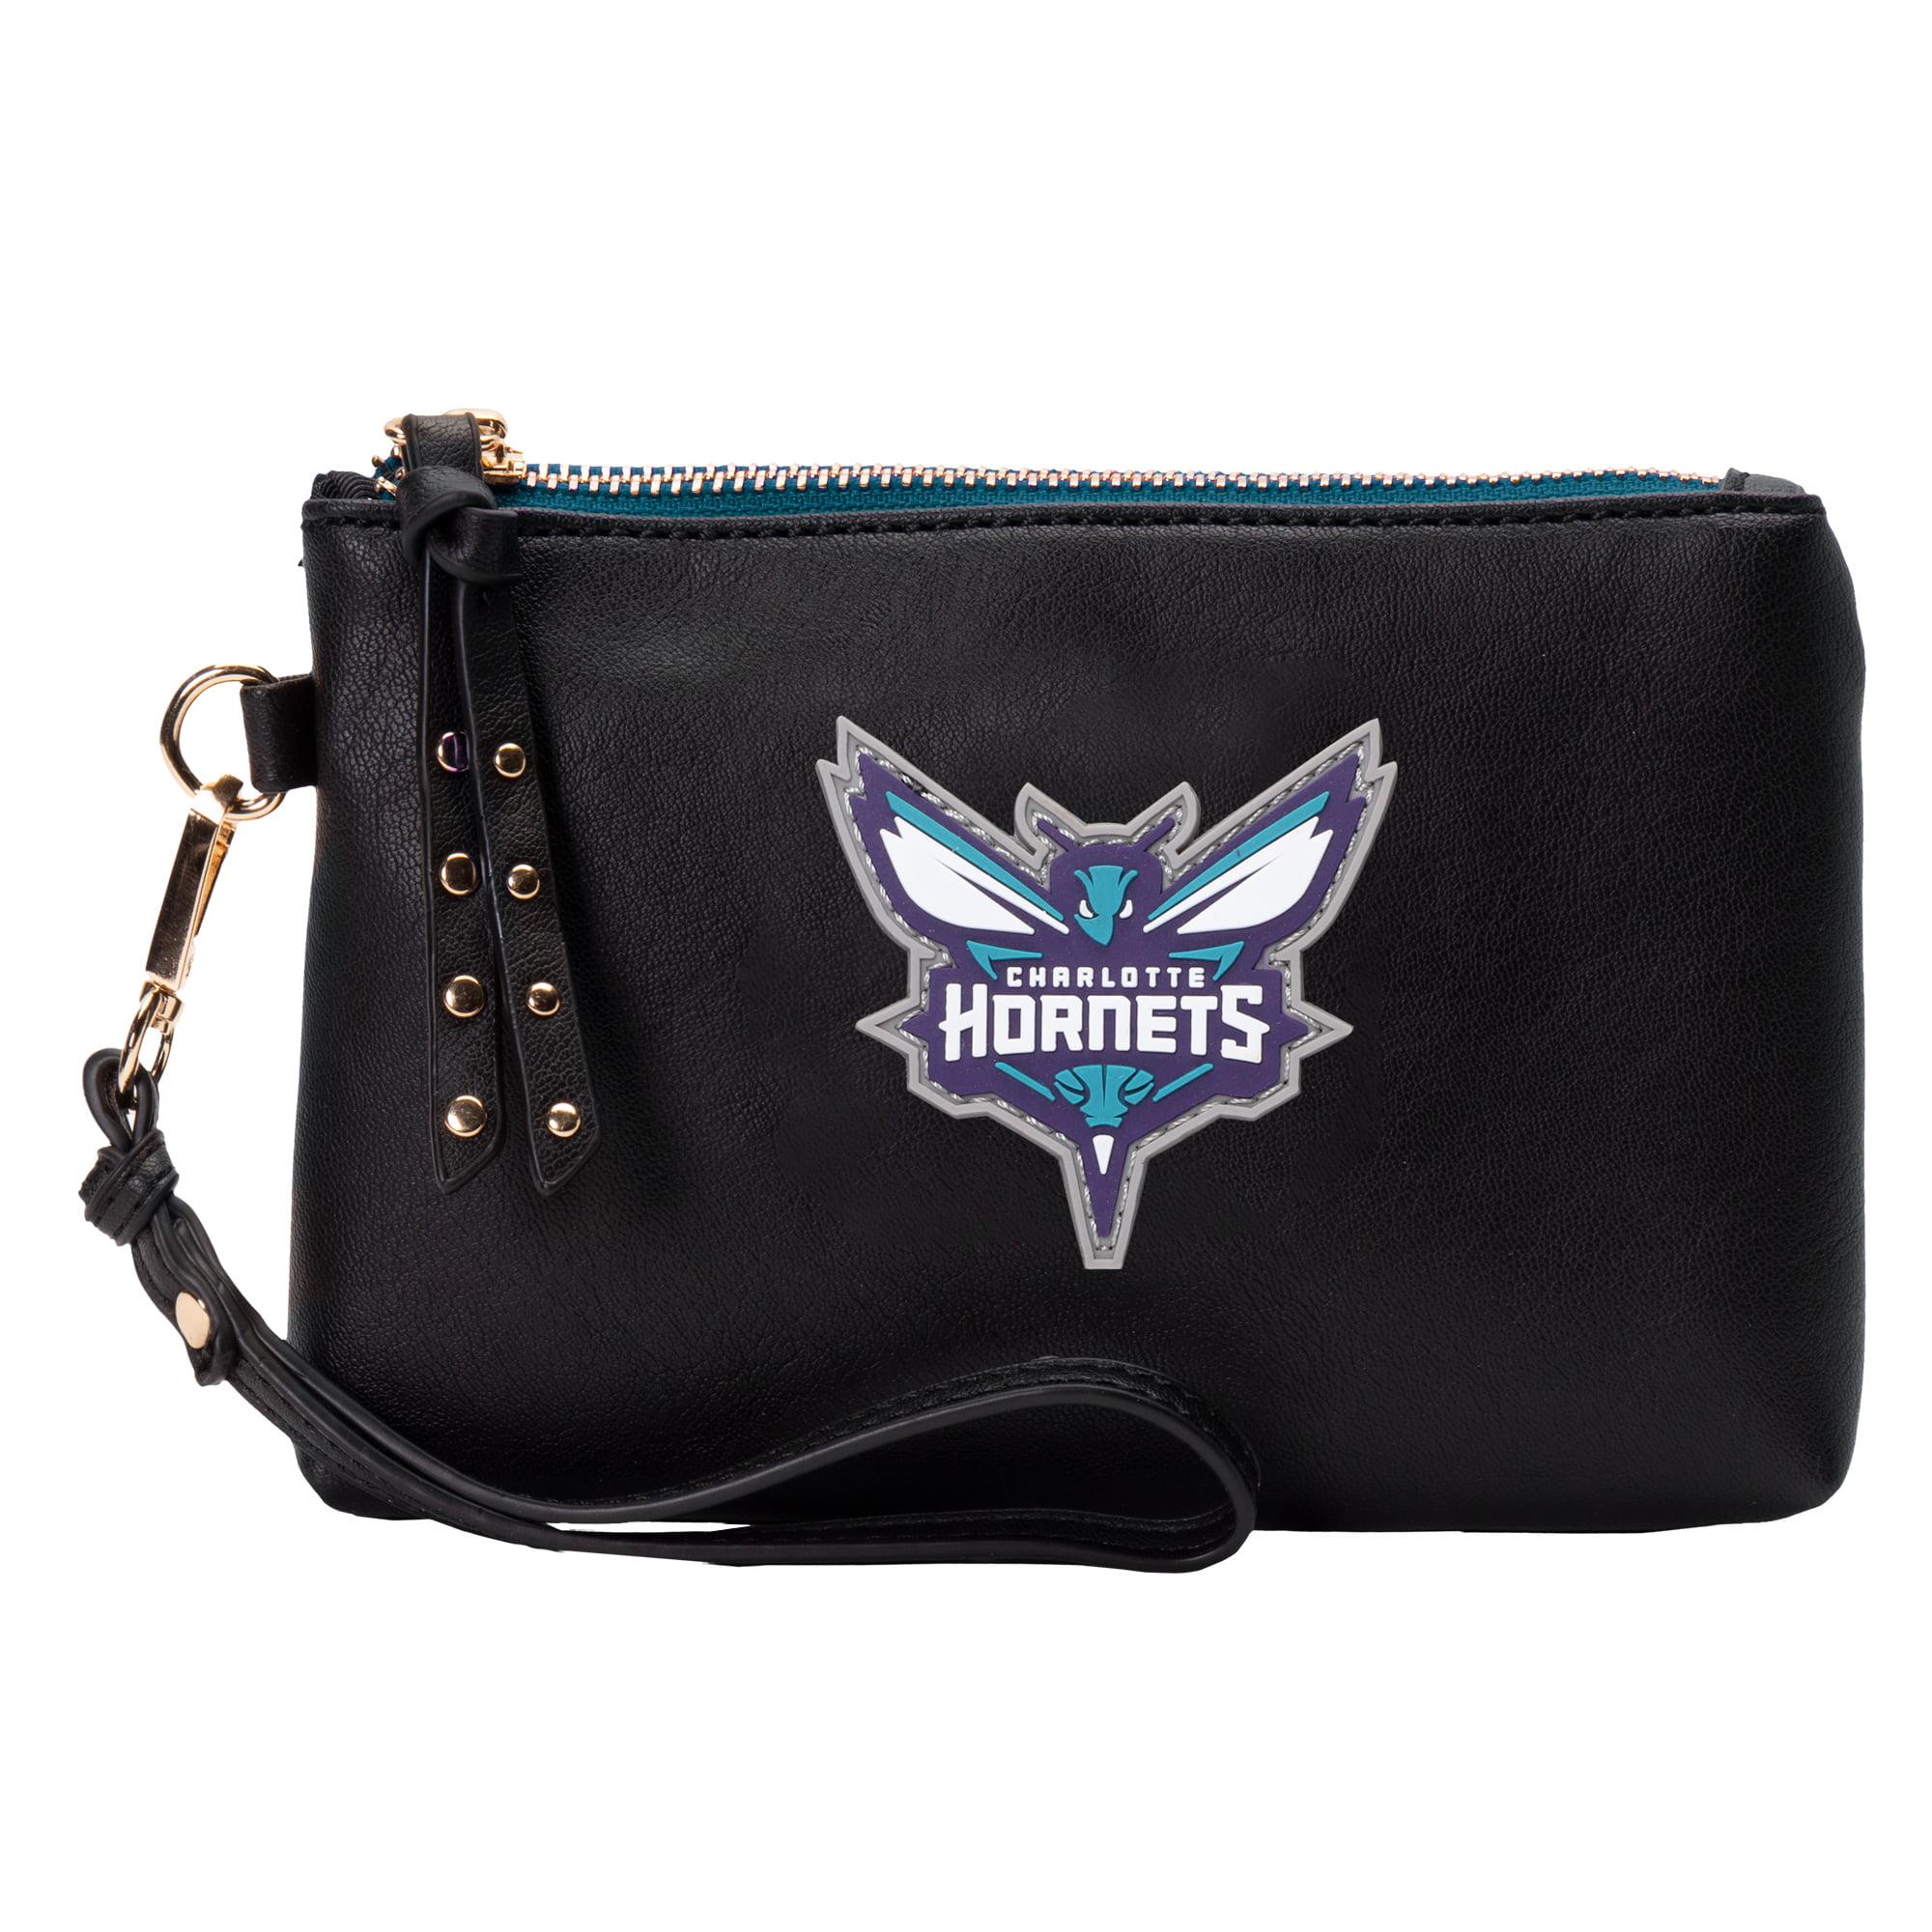 Charlotte Hornets Wristlet Pouch - No Size